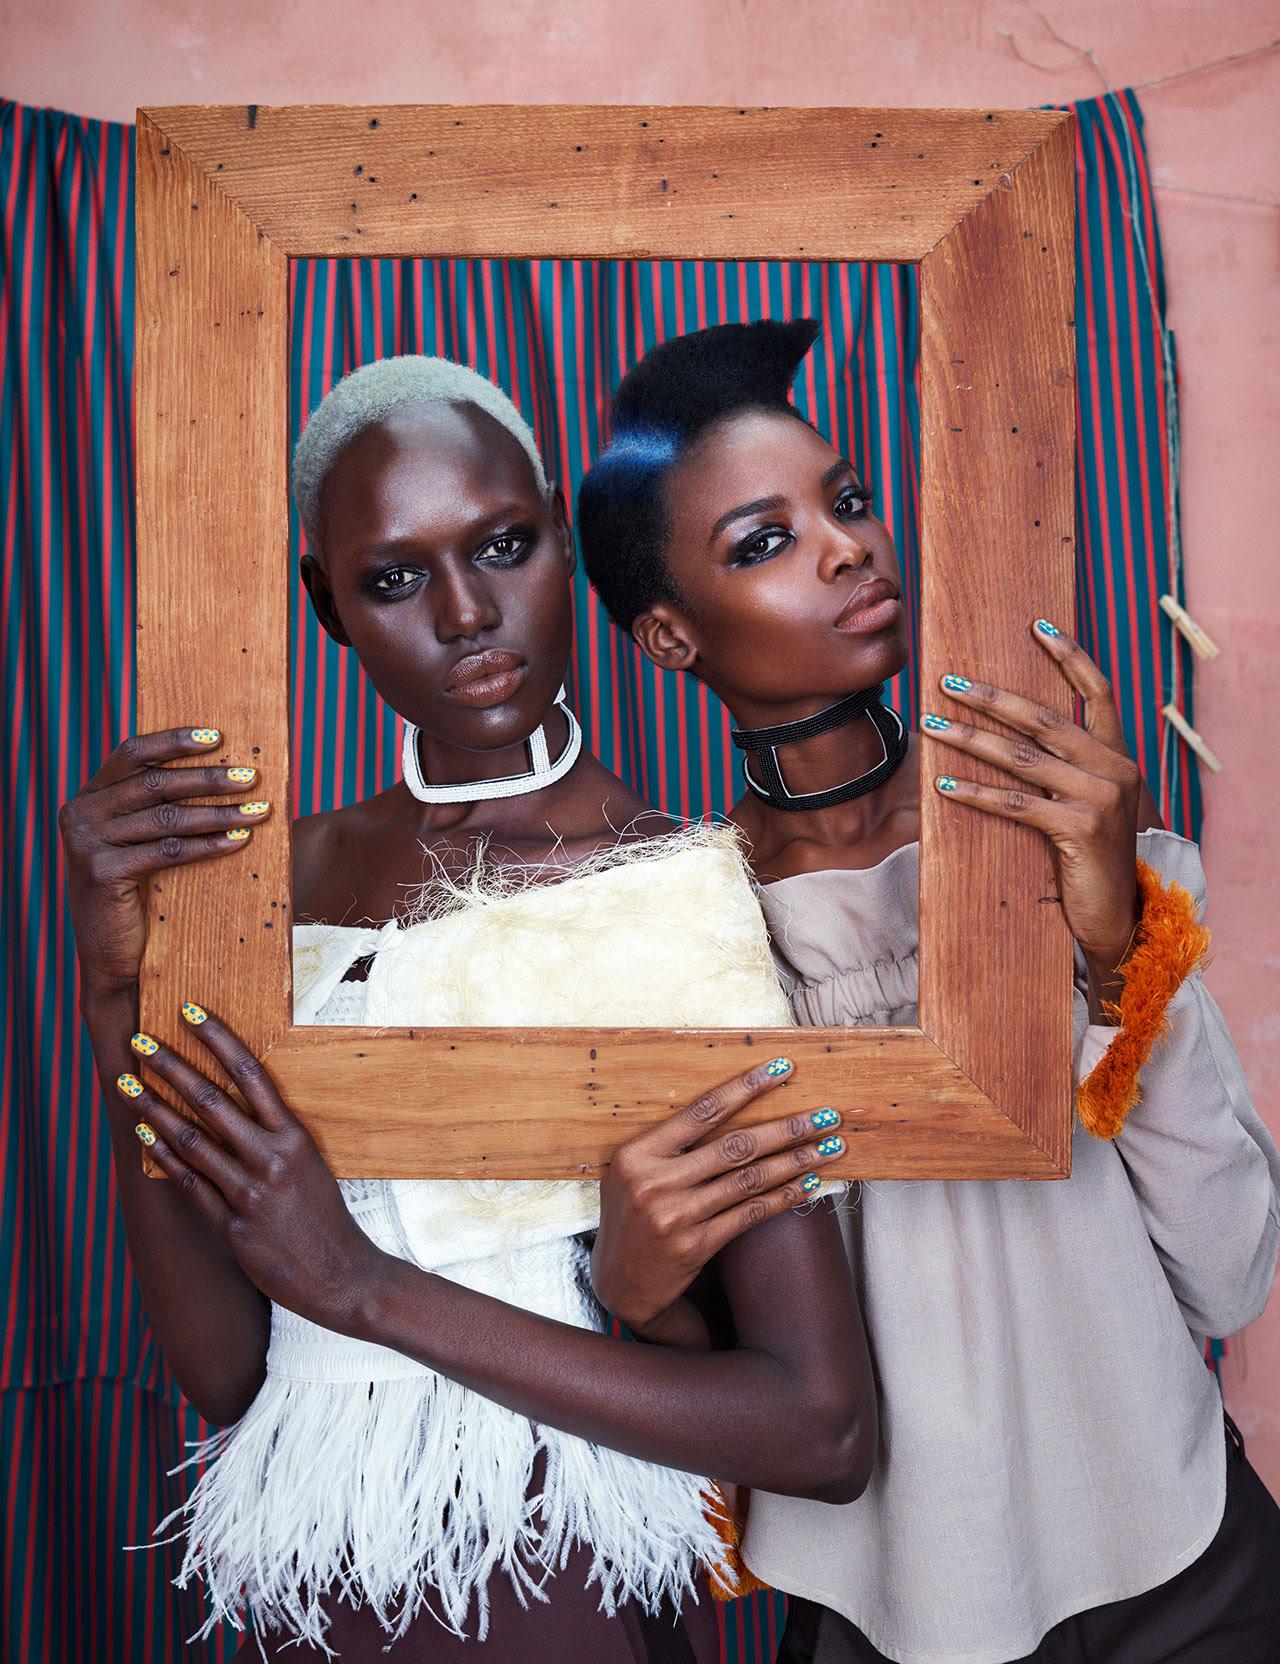 Maria-Borges-Ajak-Deng-Africa-rising-models.com-January-2016